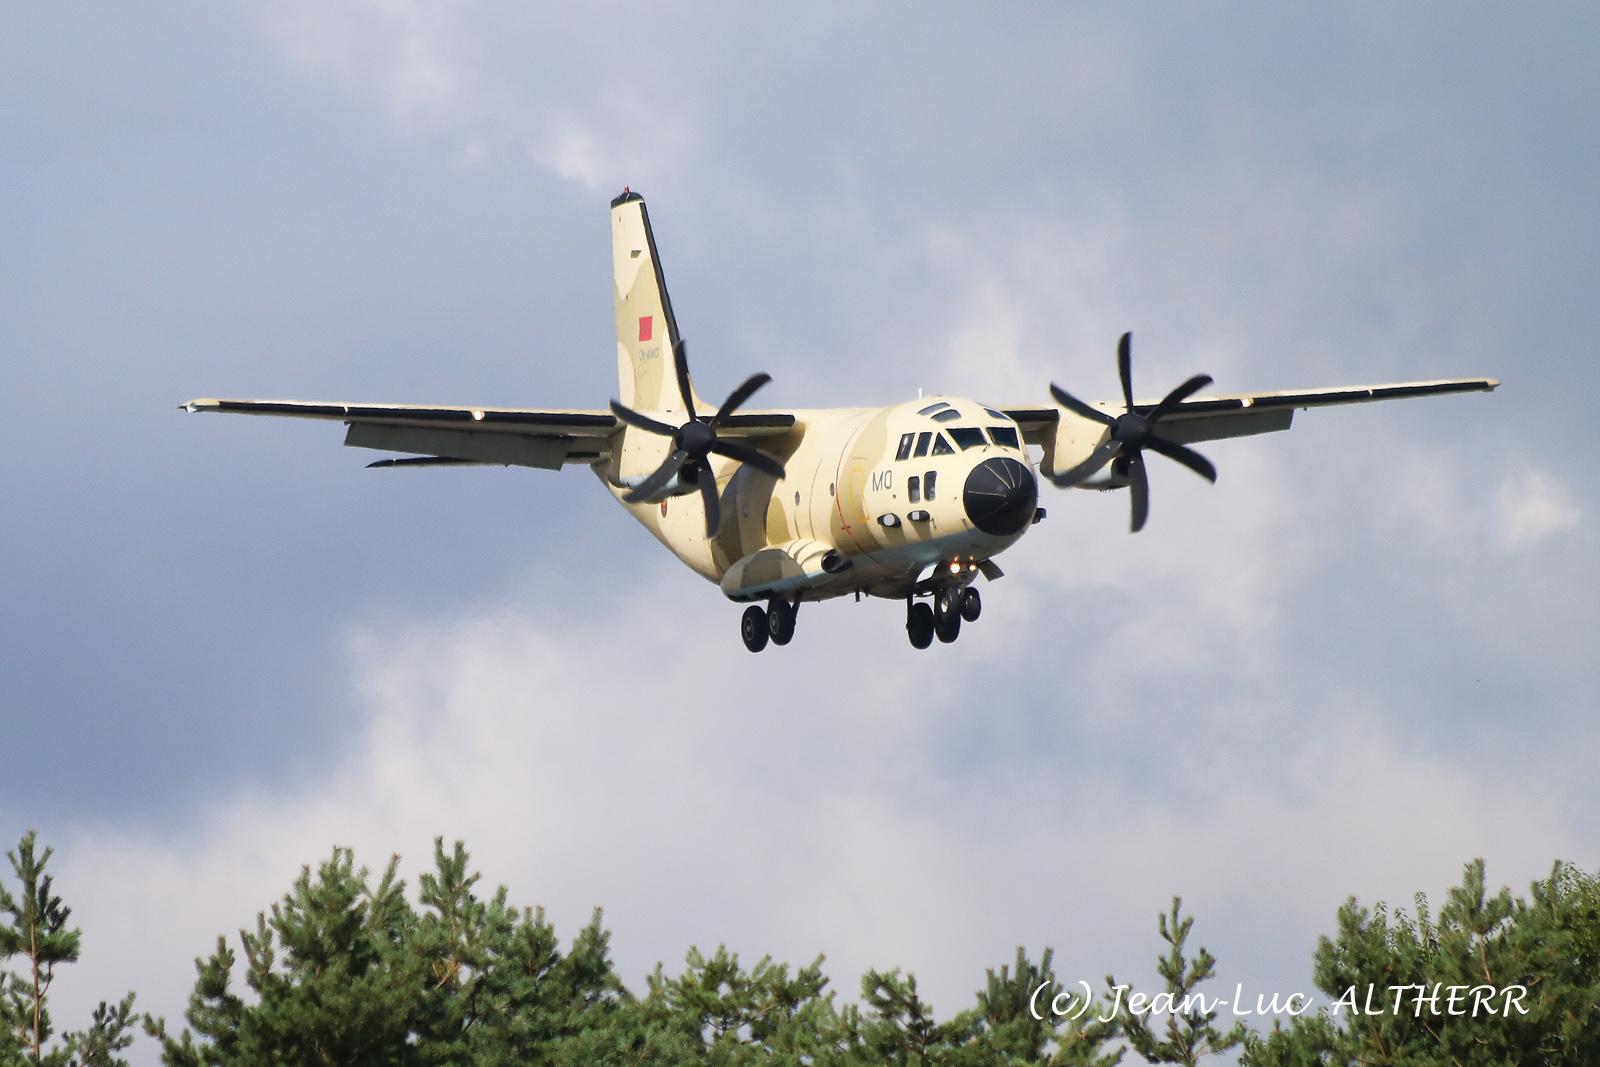 FRA: Photos d'avions de transport - Page 40 50100391052_bc314e83ab_o_d